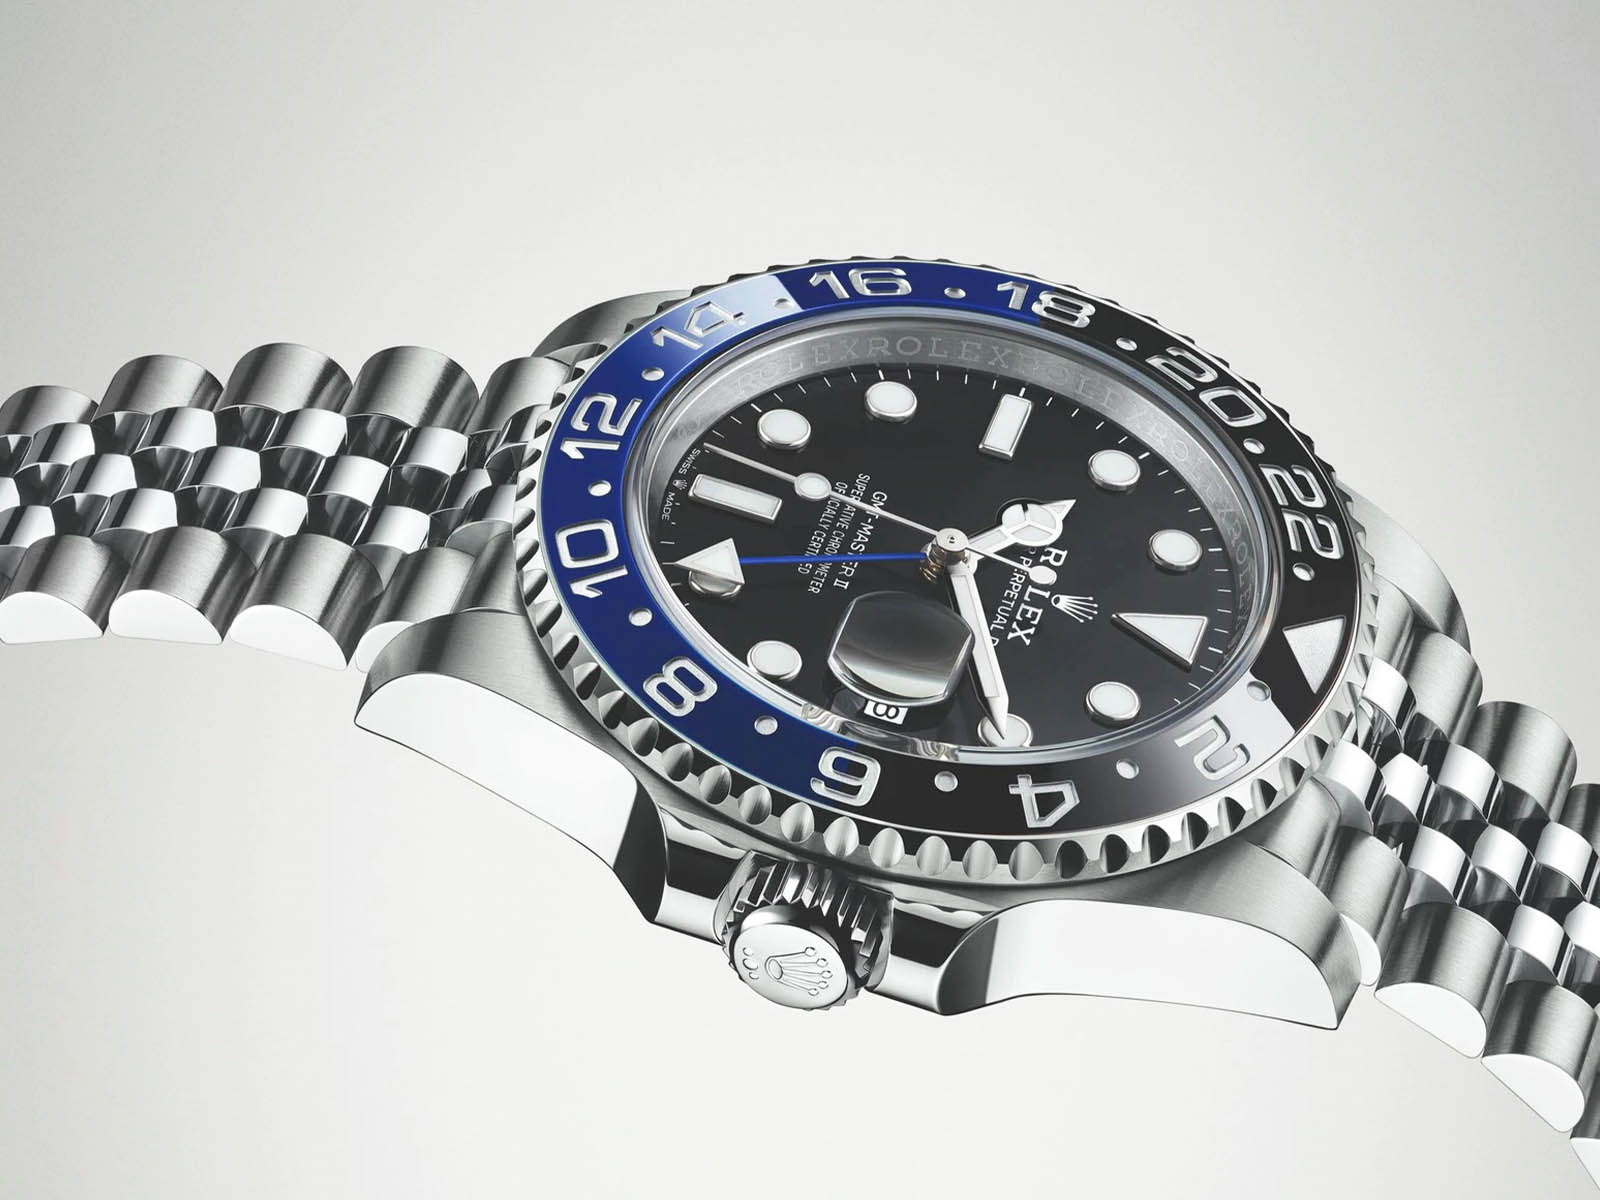 126710blnr-rolex-oyster-perpetual-gmt-master-2-batman-jubilee-1.jpg